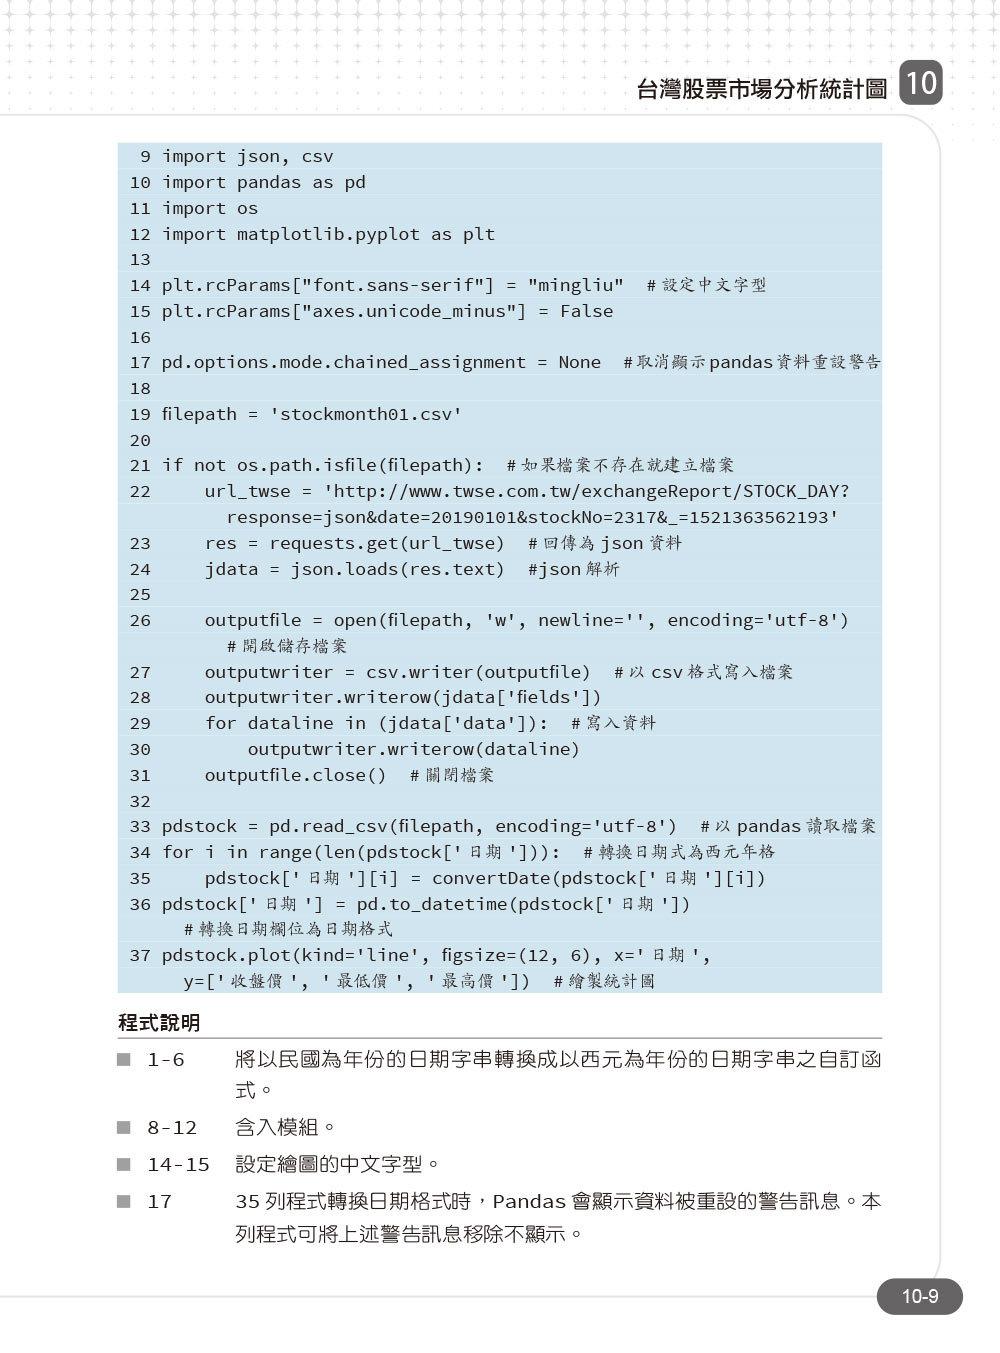 Python 大數據特訓班:資料自動化收集、整理、清洗、儲存、分析與應用實戰, 2/e (附300分鐘影音教學/範例程式)-preview-6